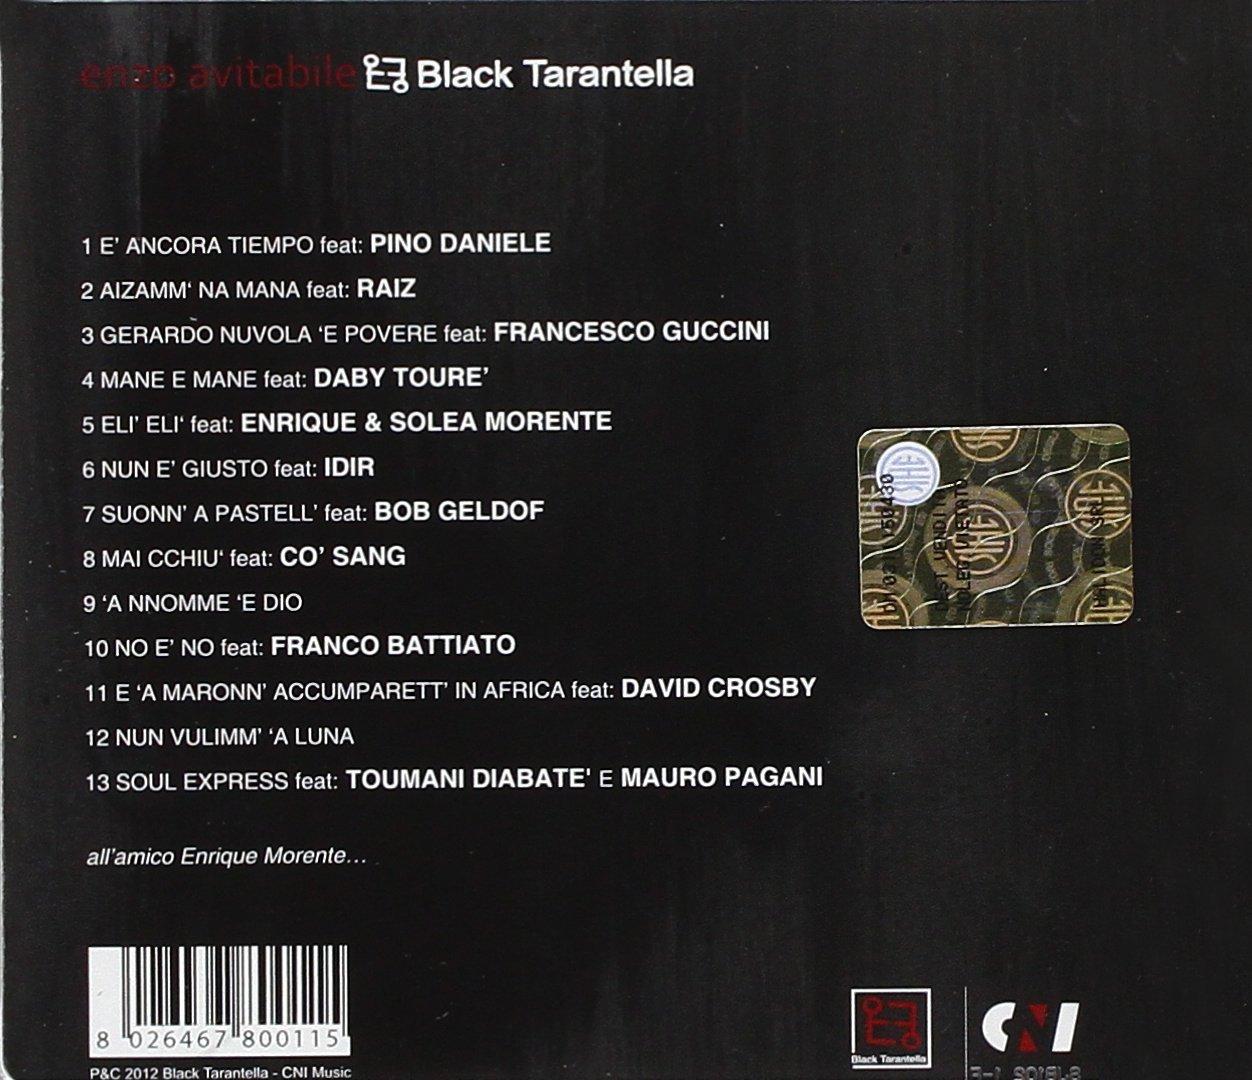 enzo avitabile black tarantella mp3